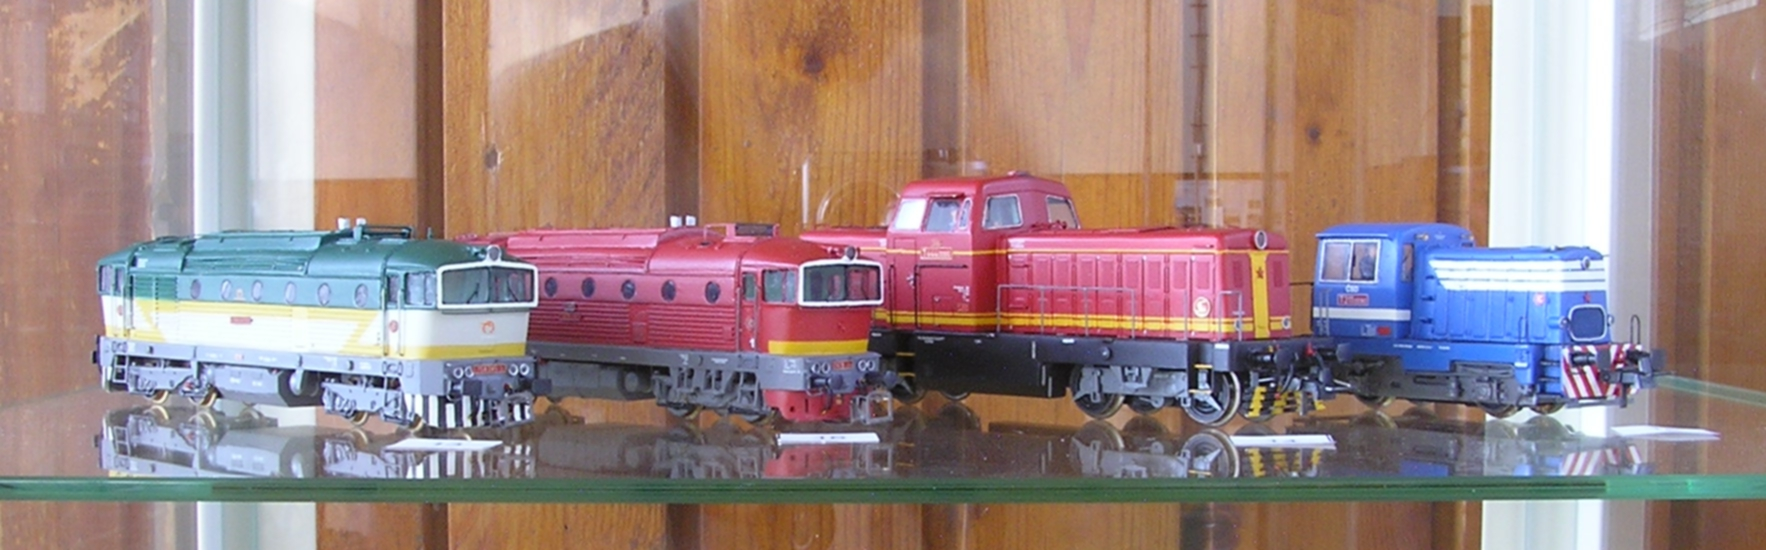 lokomotivy.JPG